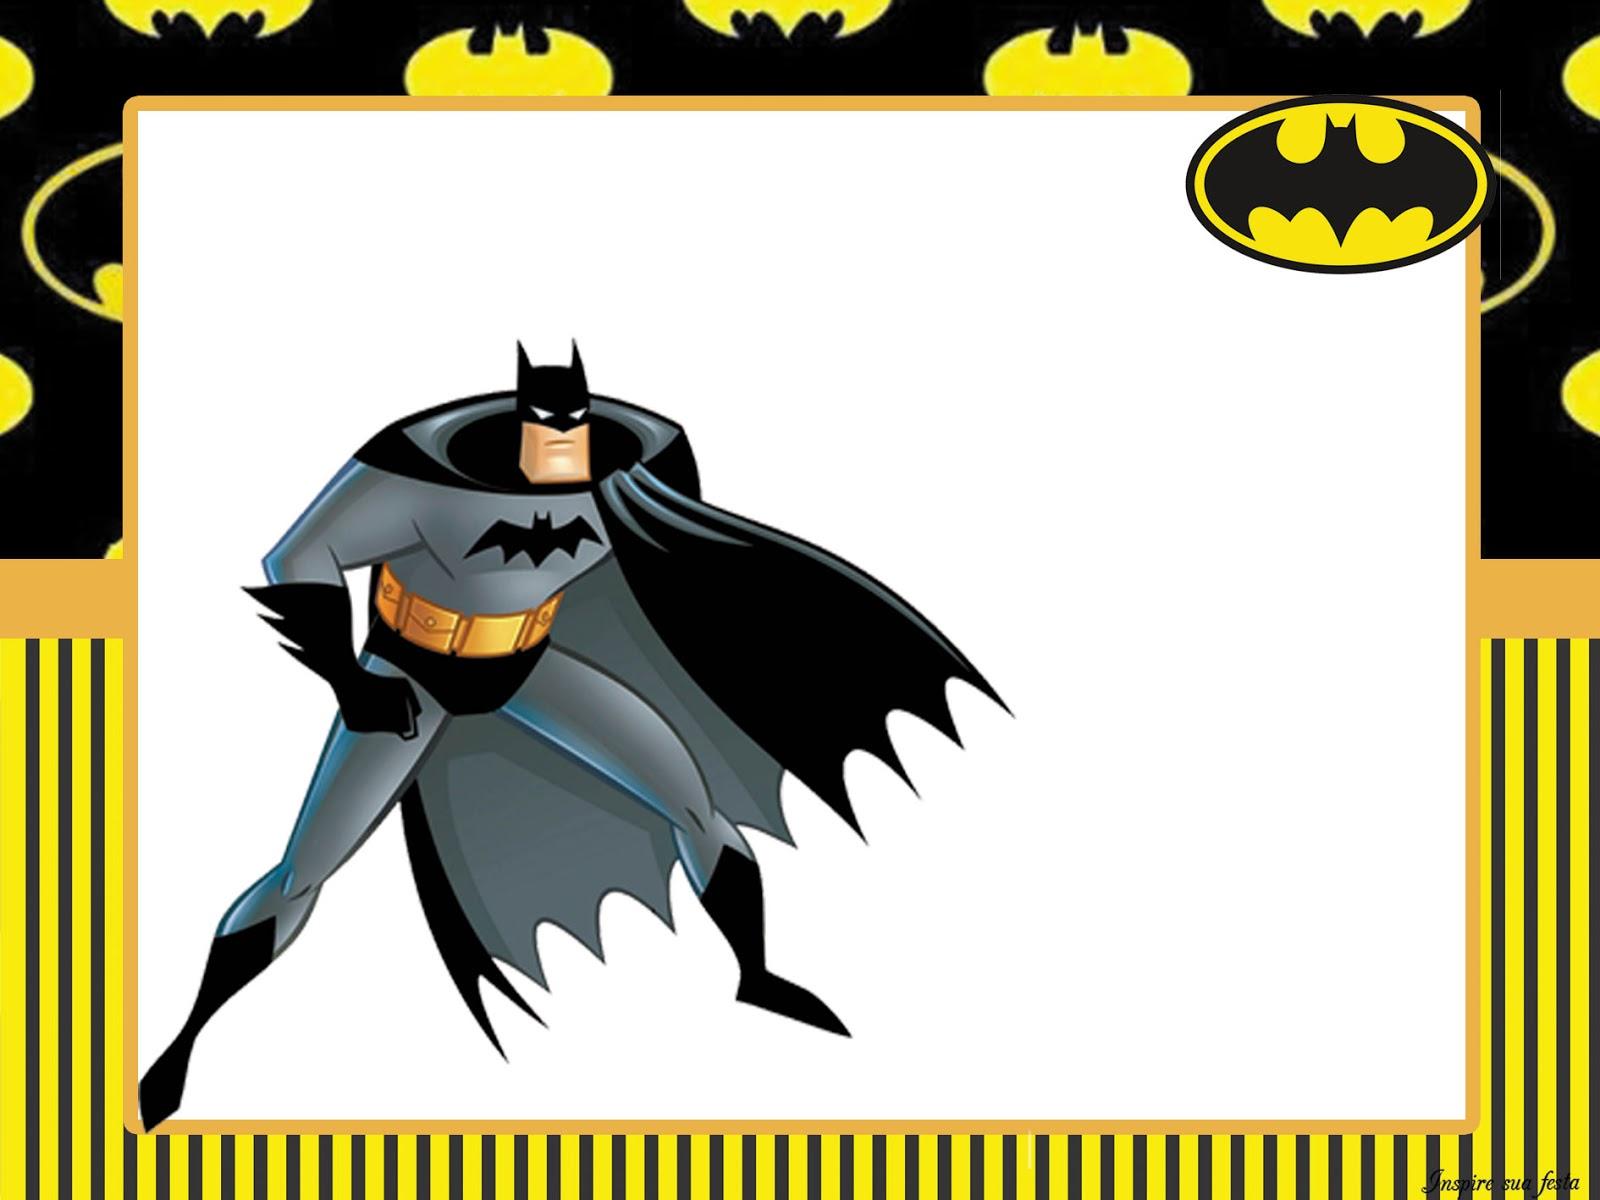 Batman Party Free Printable Invitations And SaveEnlarge Name Tags